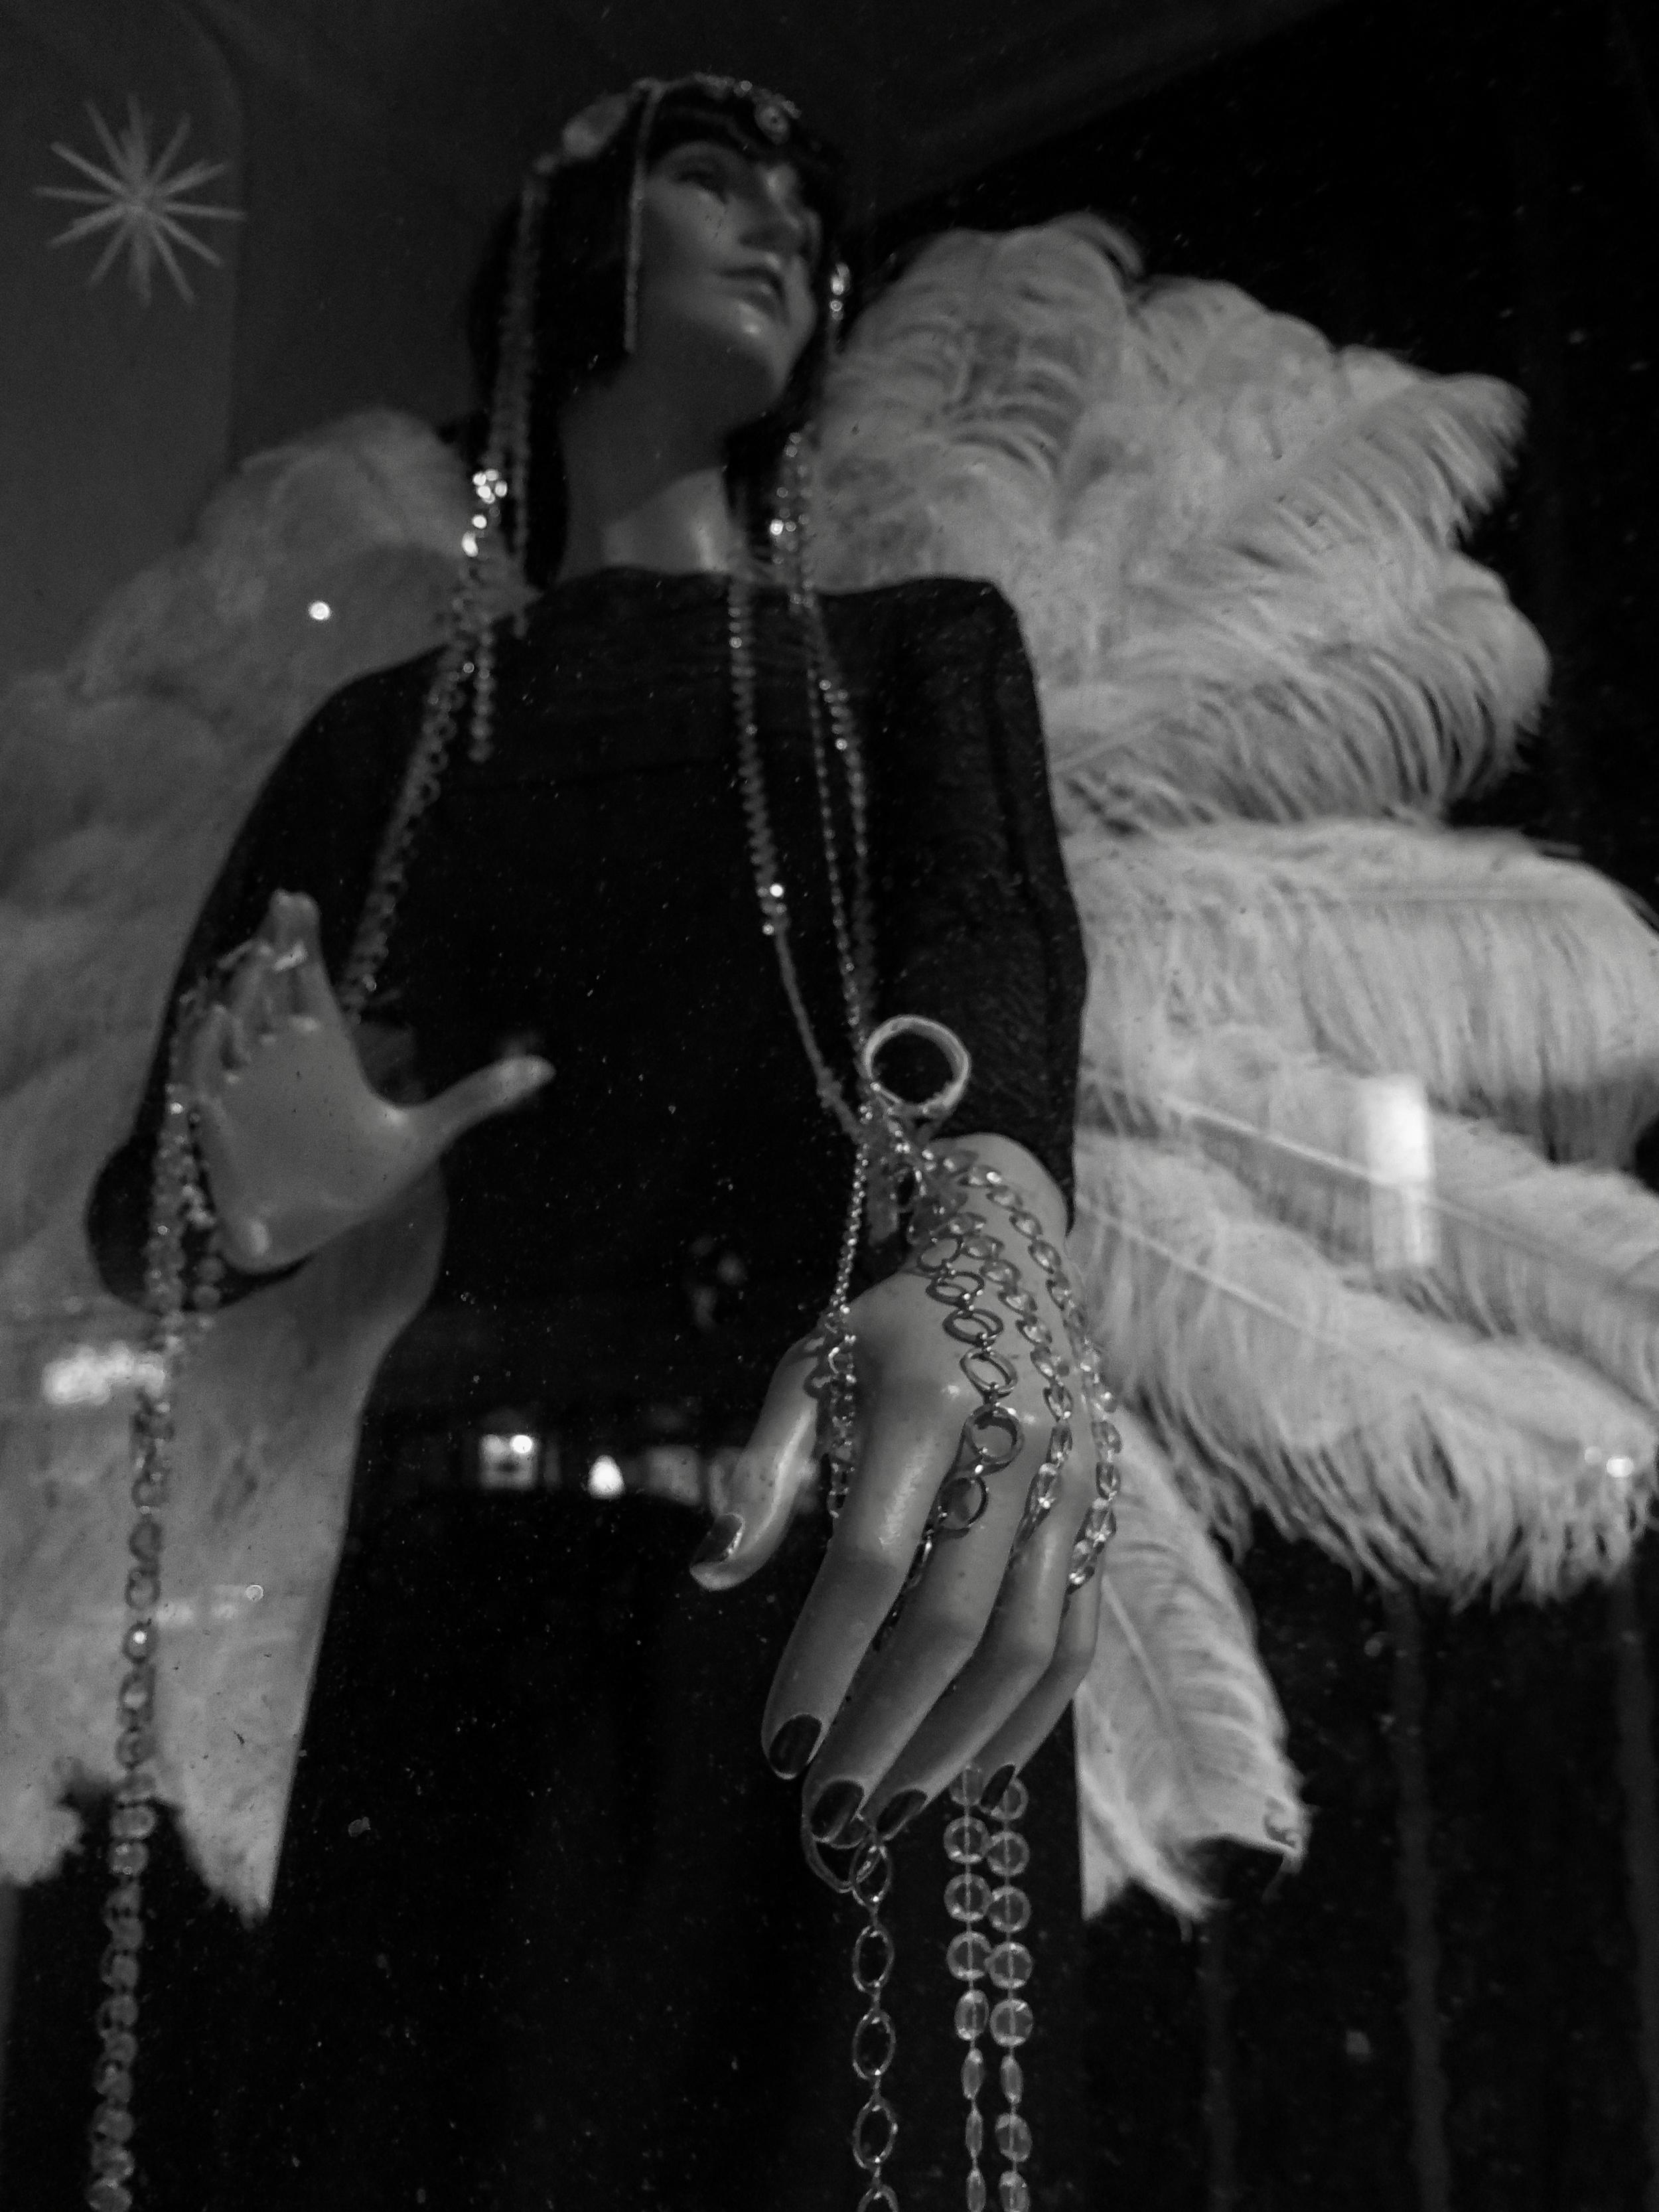 1:22:14 window angel b:w.jpeg